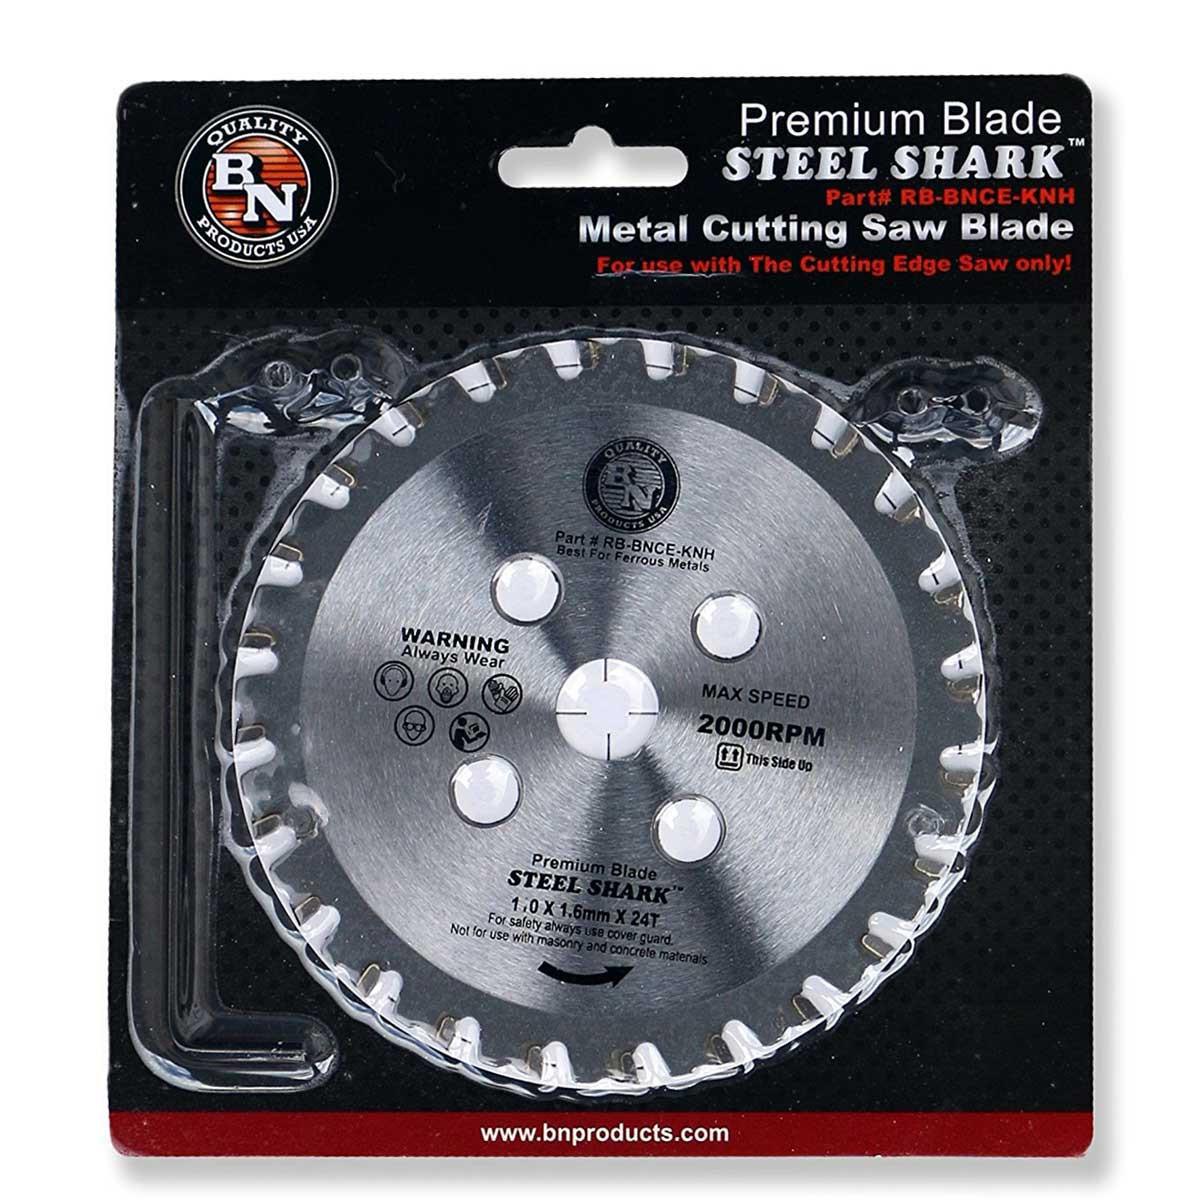 RB-BNCE-NH Cutting Edge Saw Blade